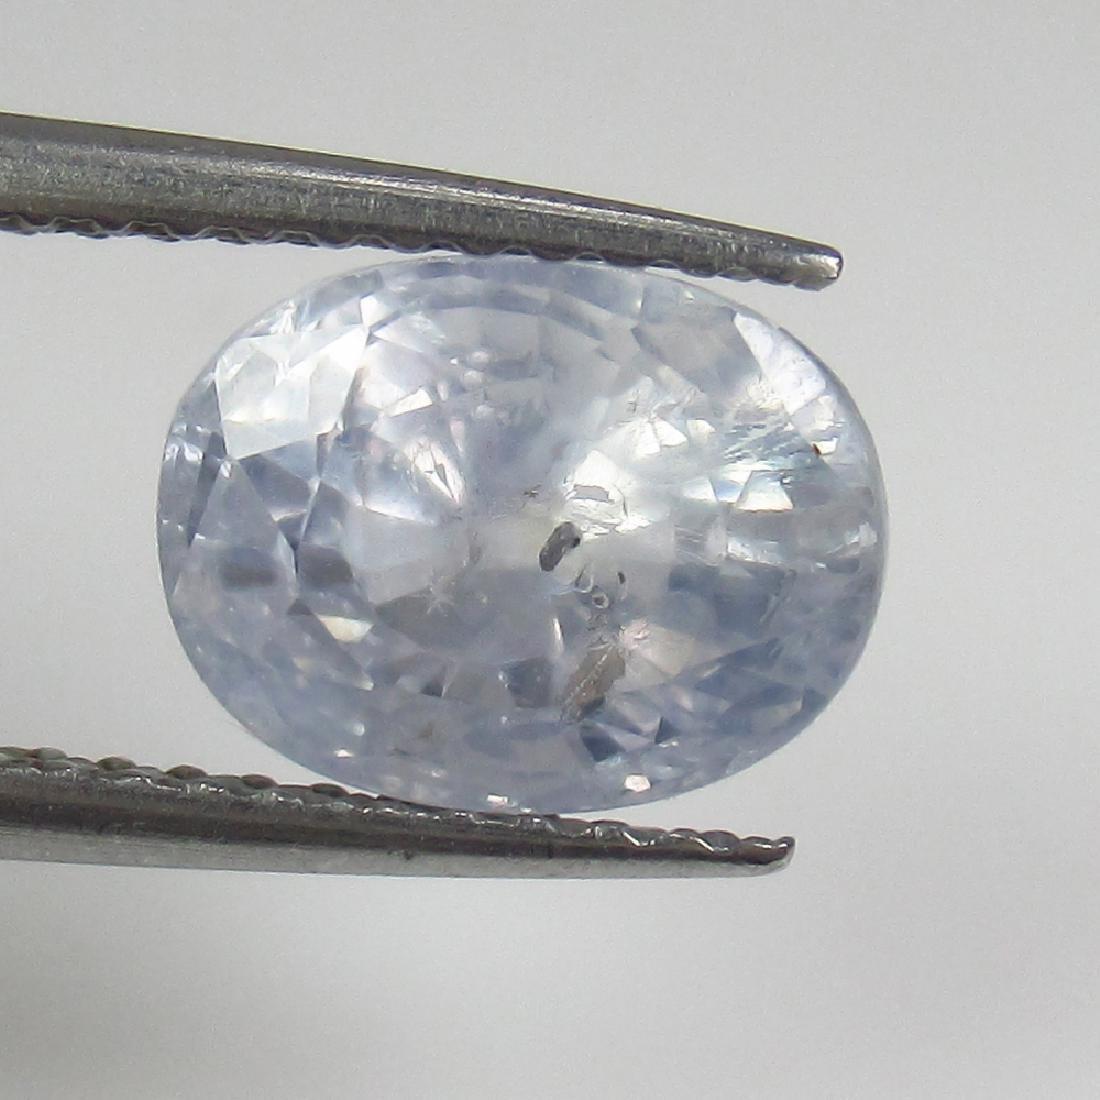 3.16 Ct Genuine Ceylon Unheated Very Light Blue